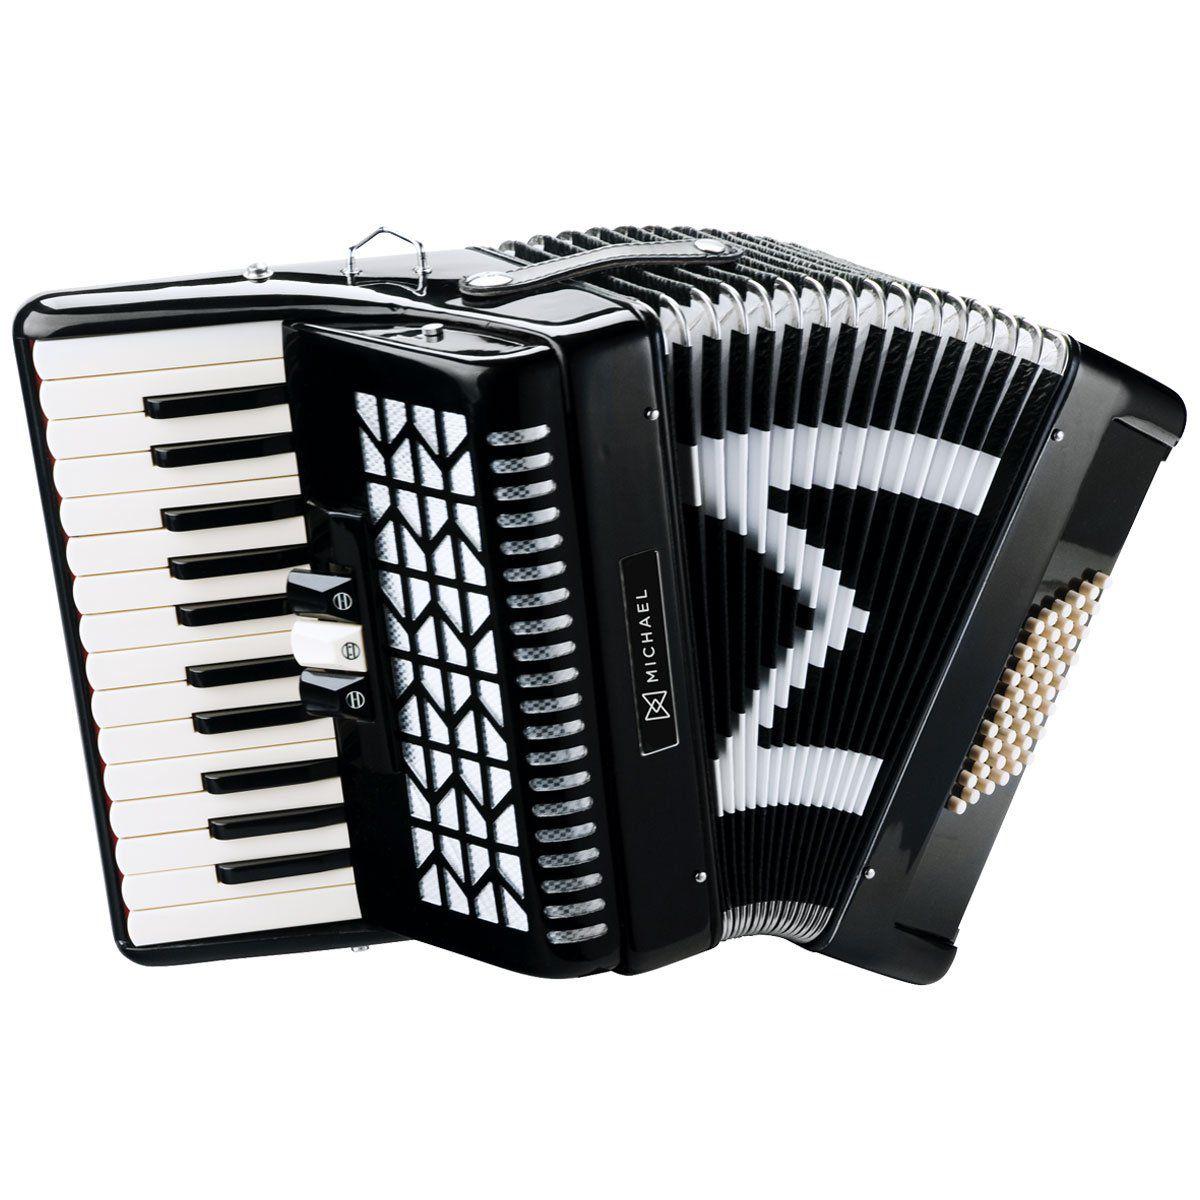 Acordeon Michael 48 Baixos Acm4803 Preto  - Luggi Instrumentos Musicais